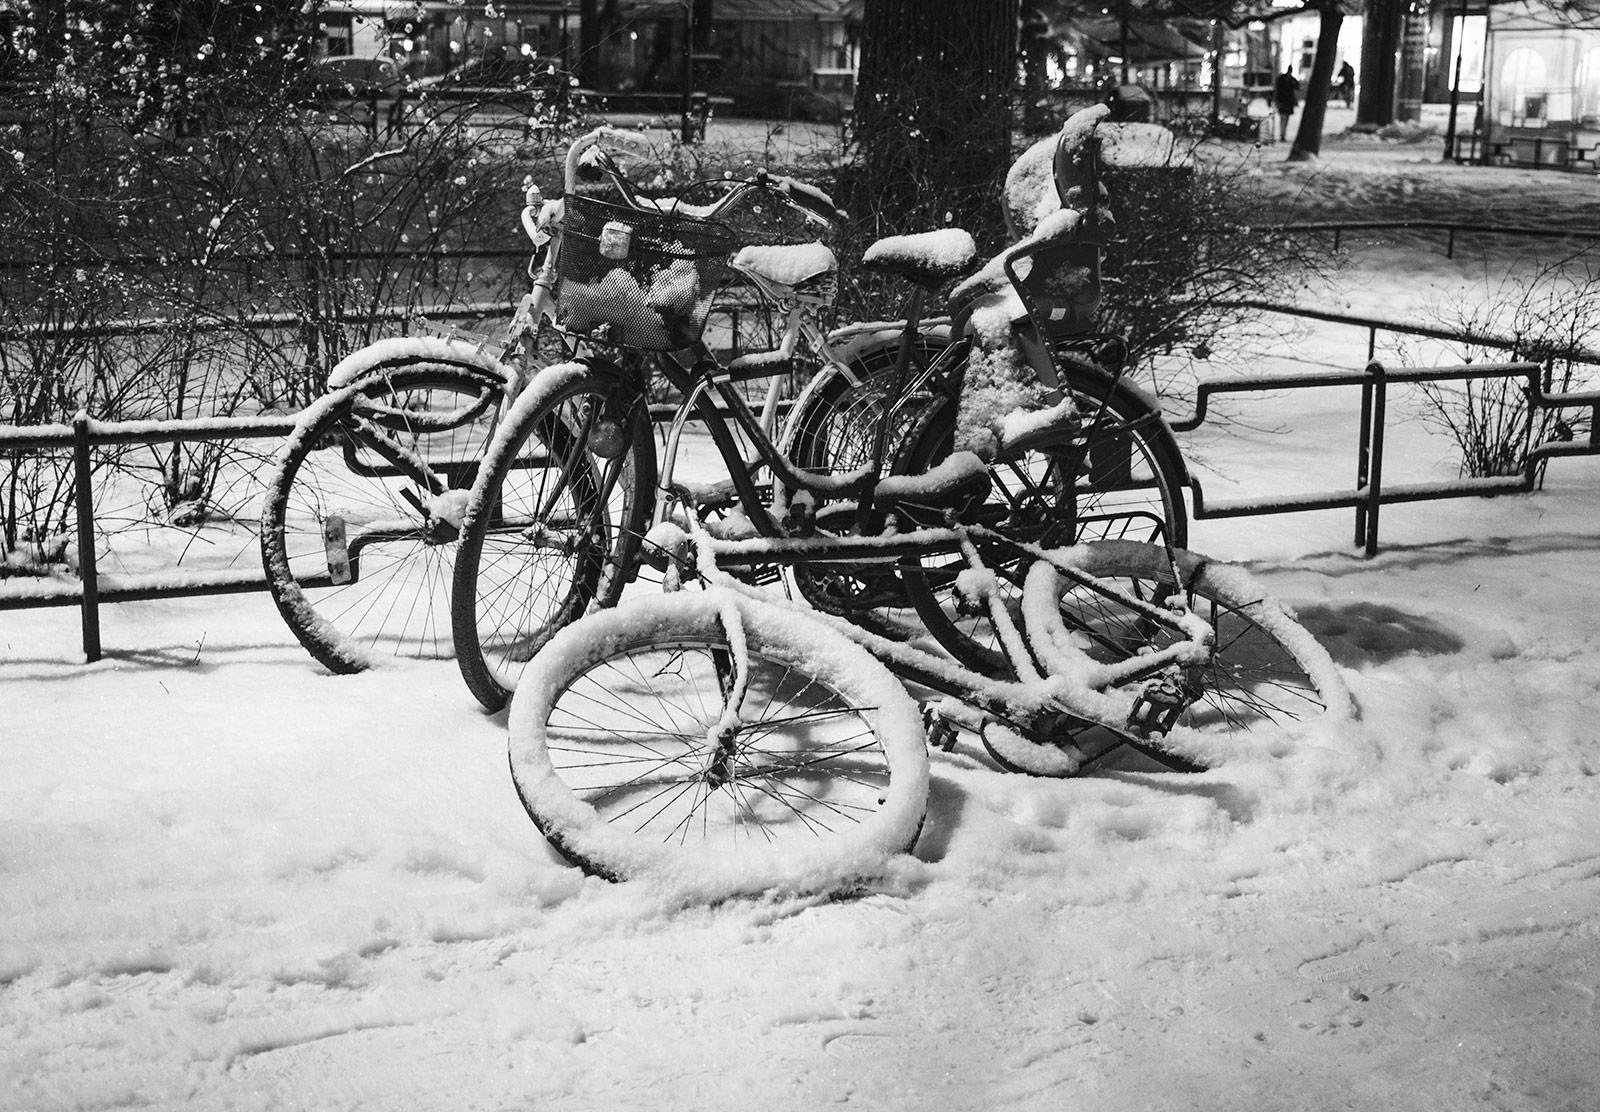 Snow covered bikes